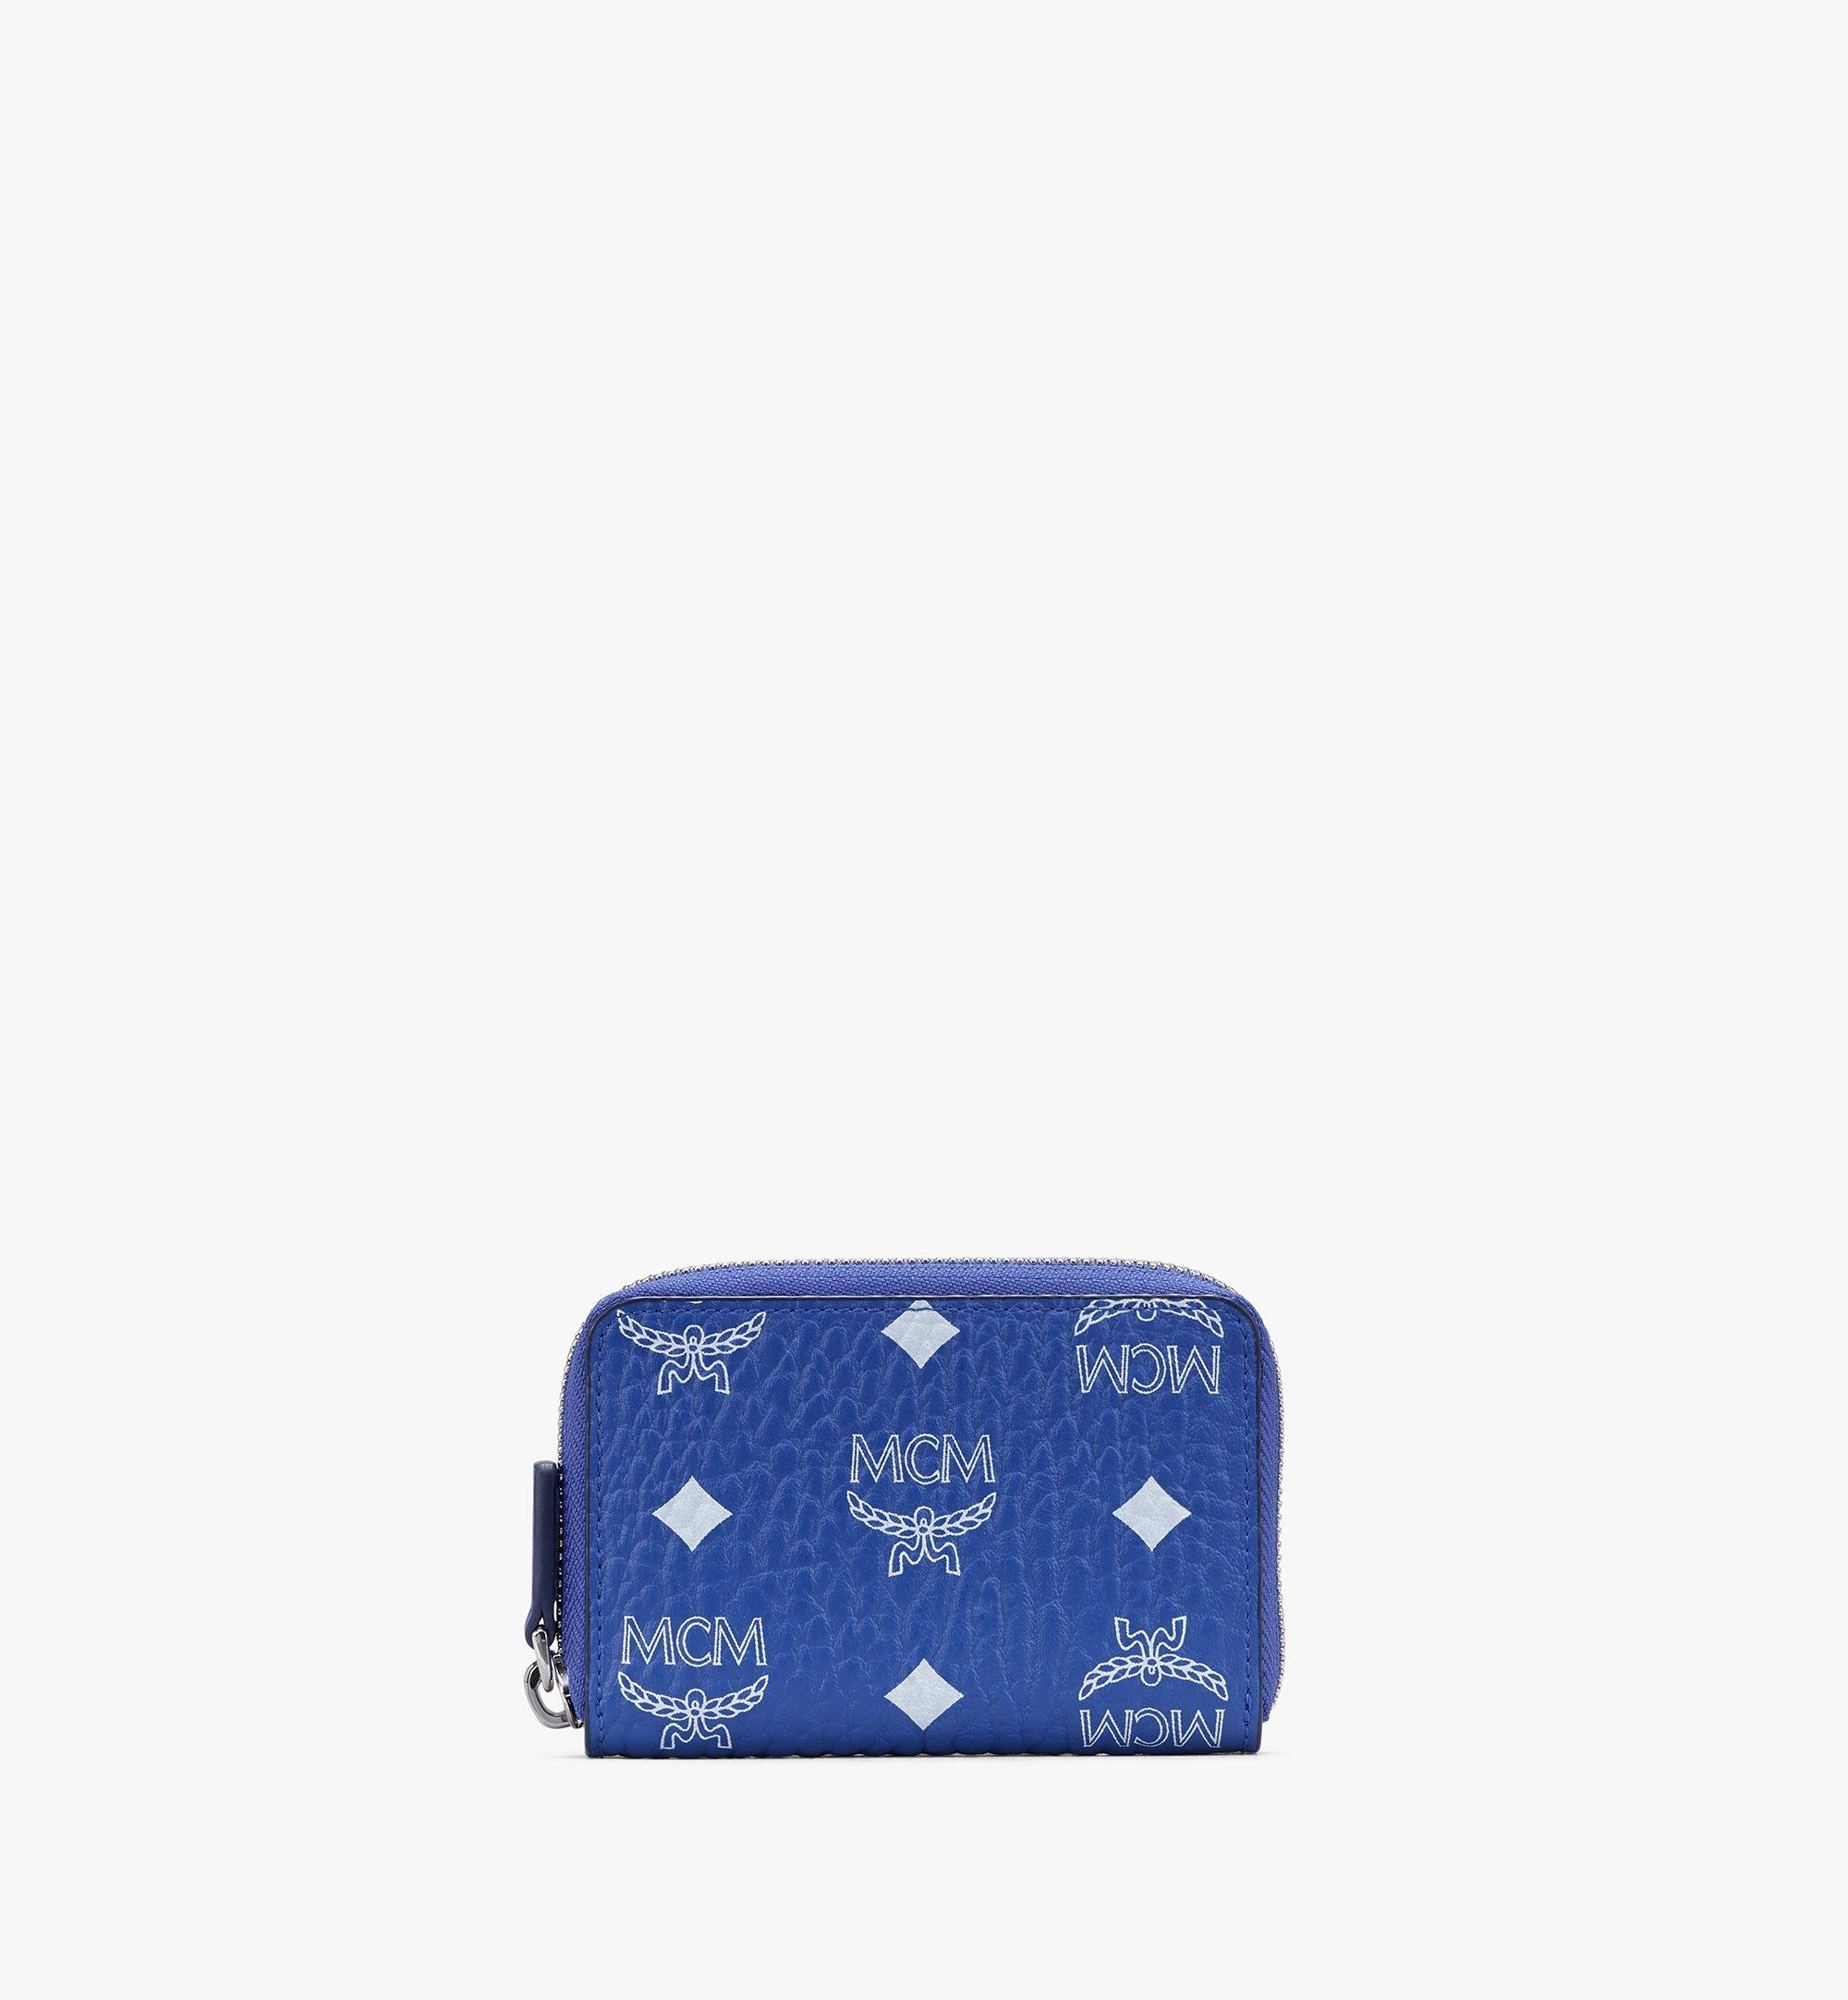 MCM Visetos 系列的全拉鏈式卡夾零錢包 Blue MXLASVI01H1001 Alternate View 1